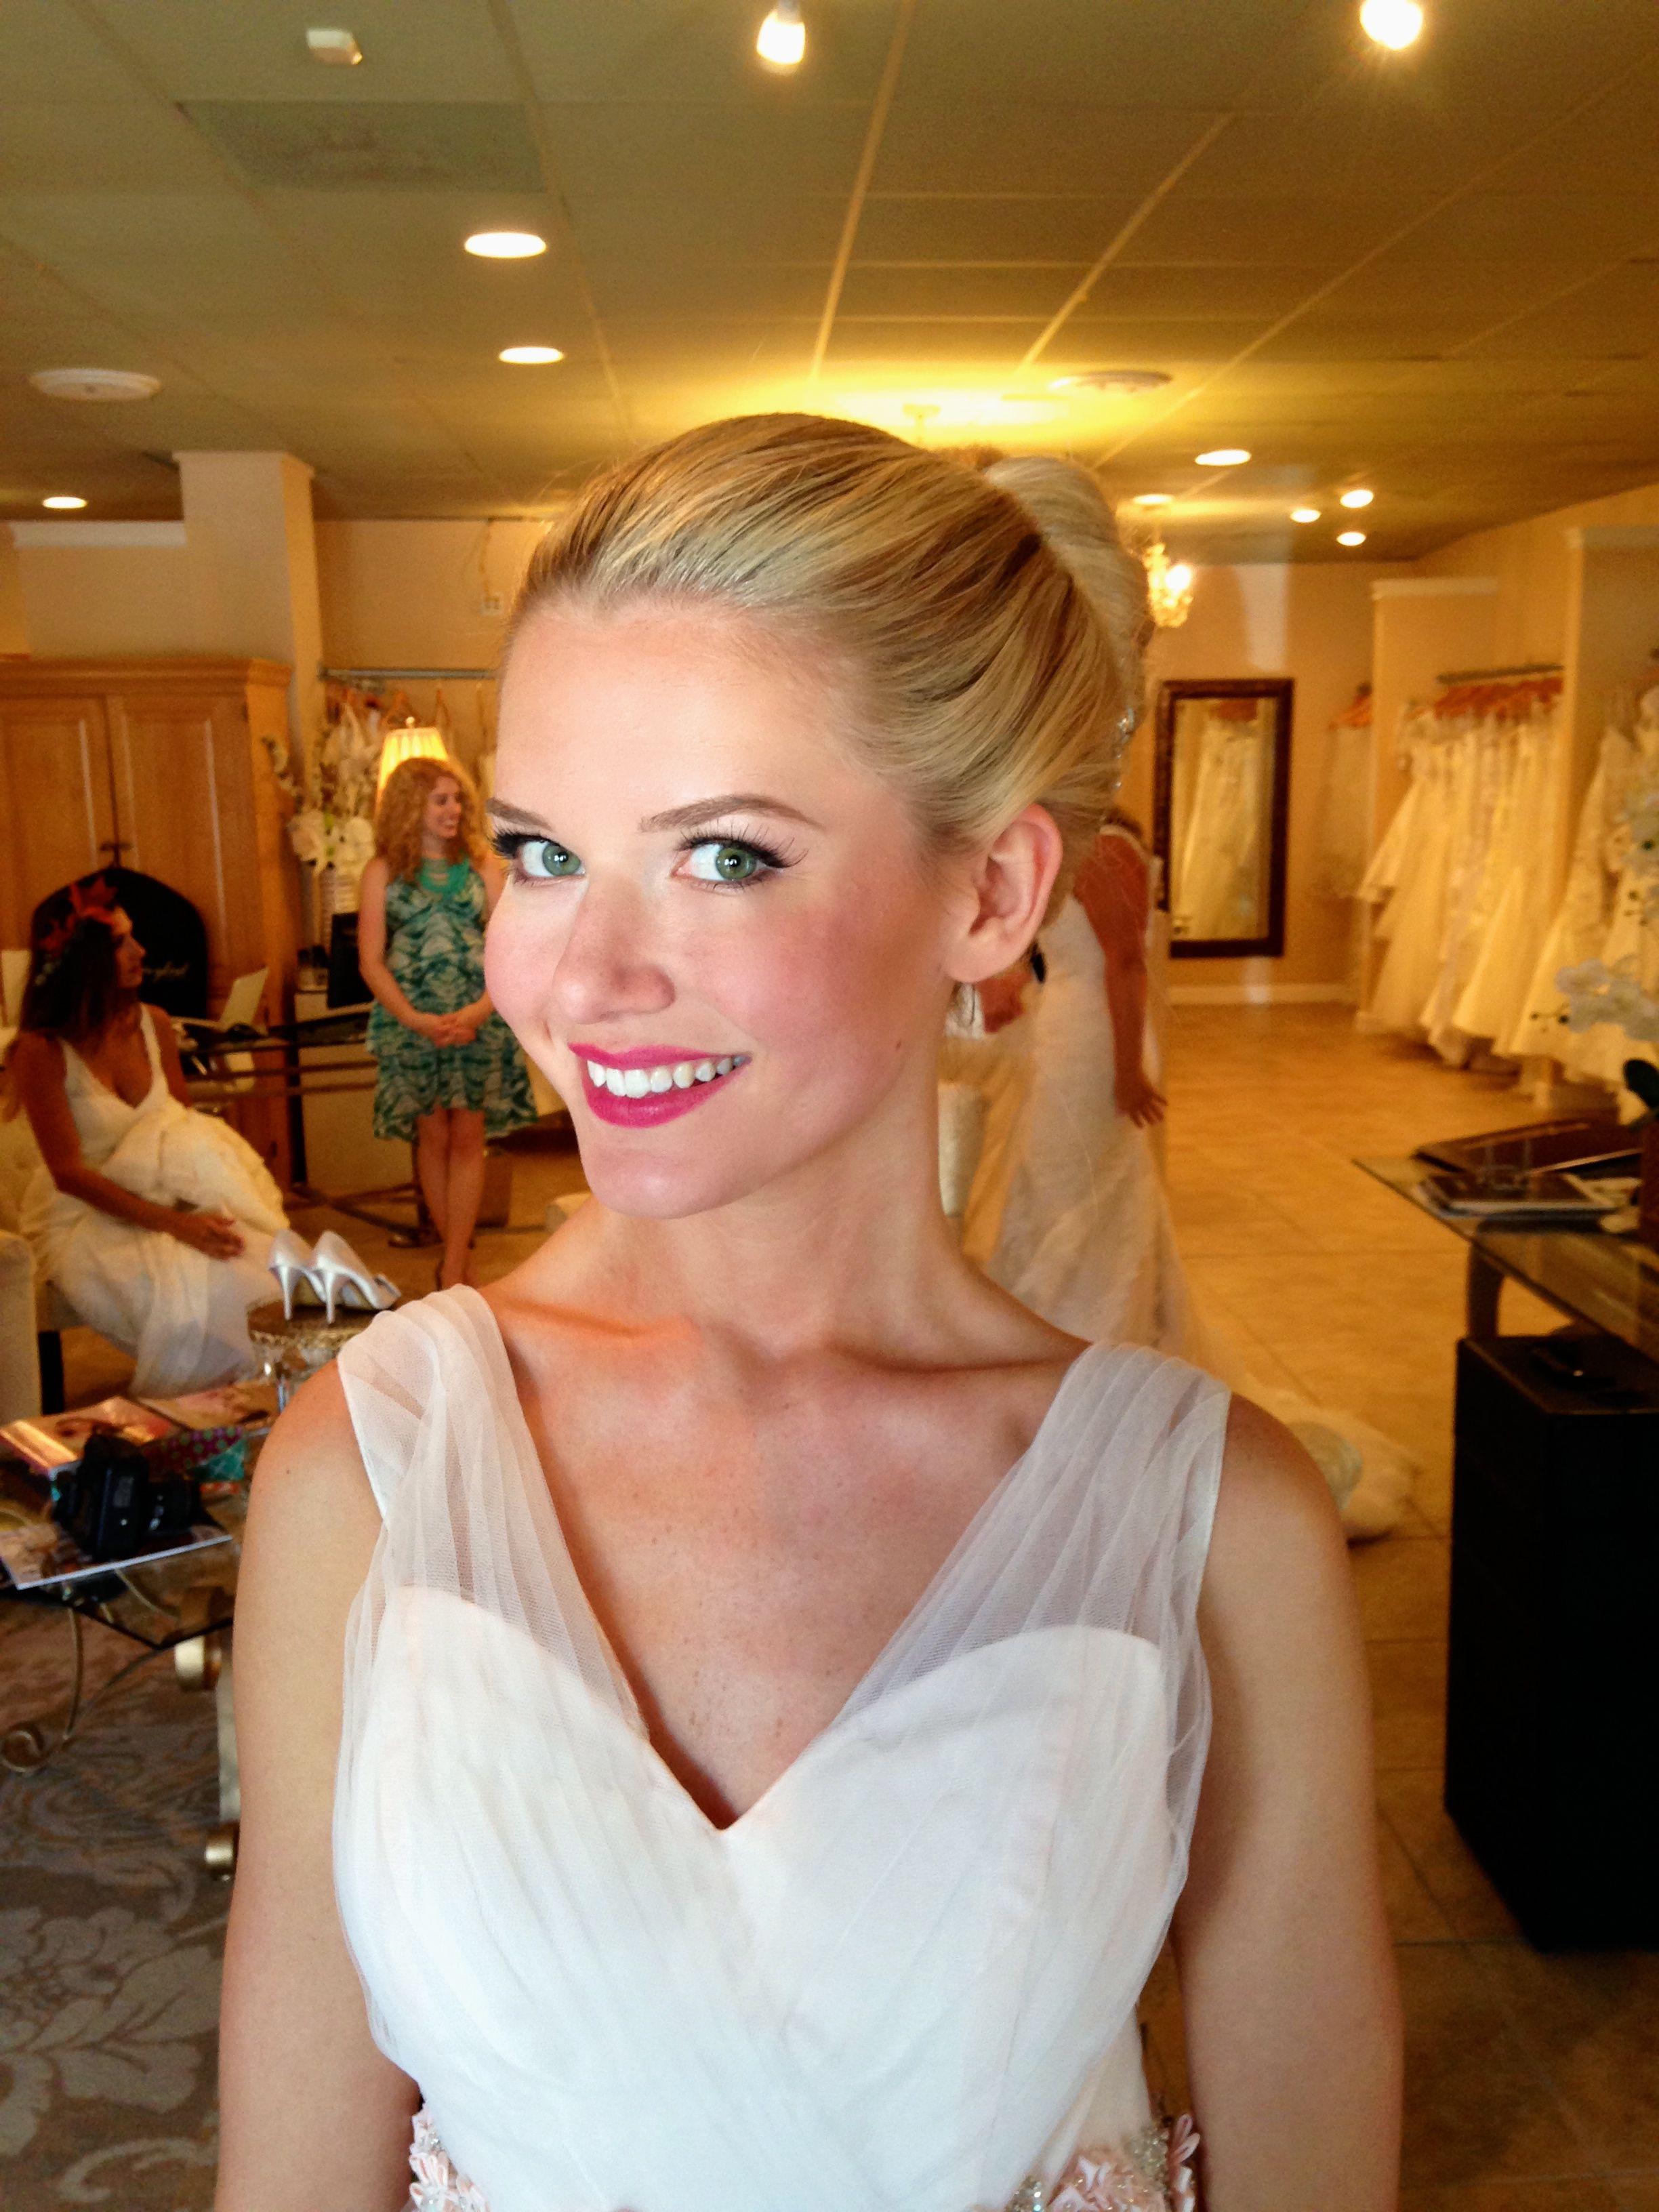 glowing, dewy, chic, ballet bun inspired pink lip bridal bridesmaid